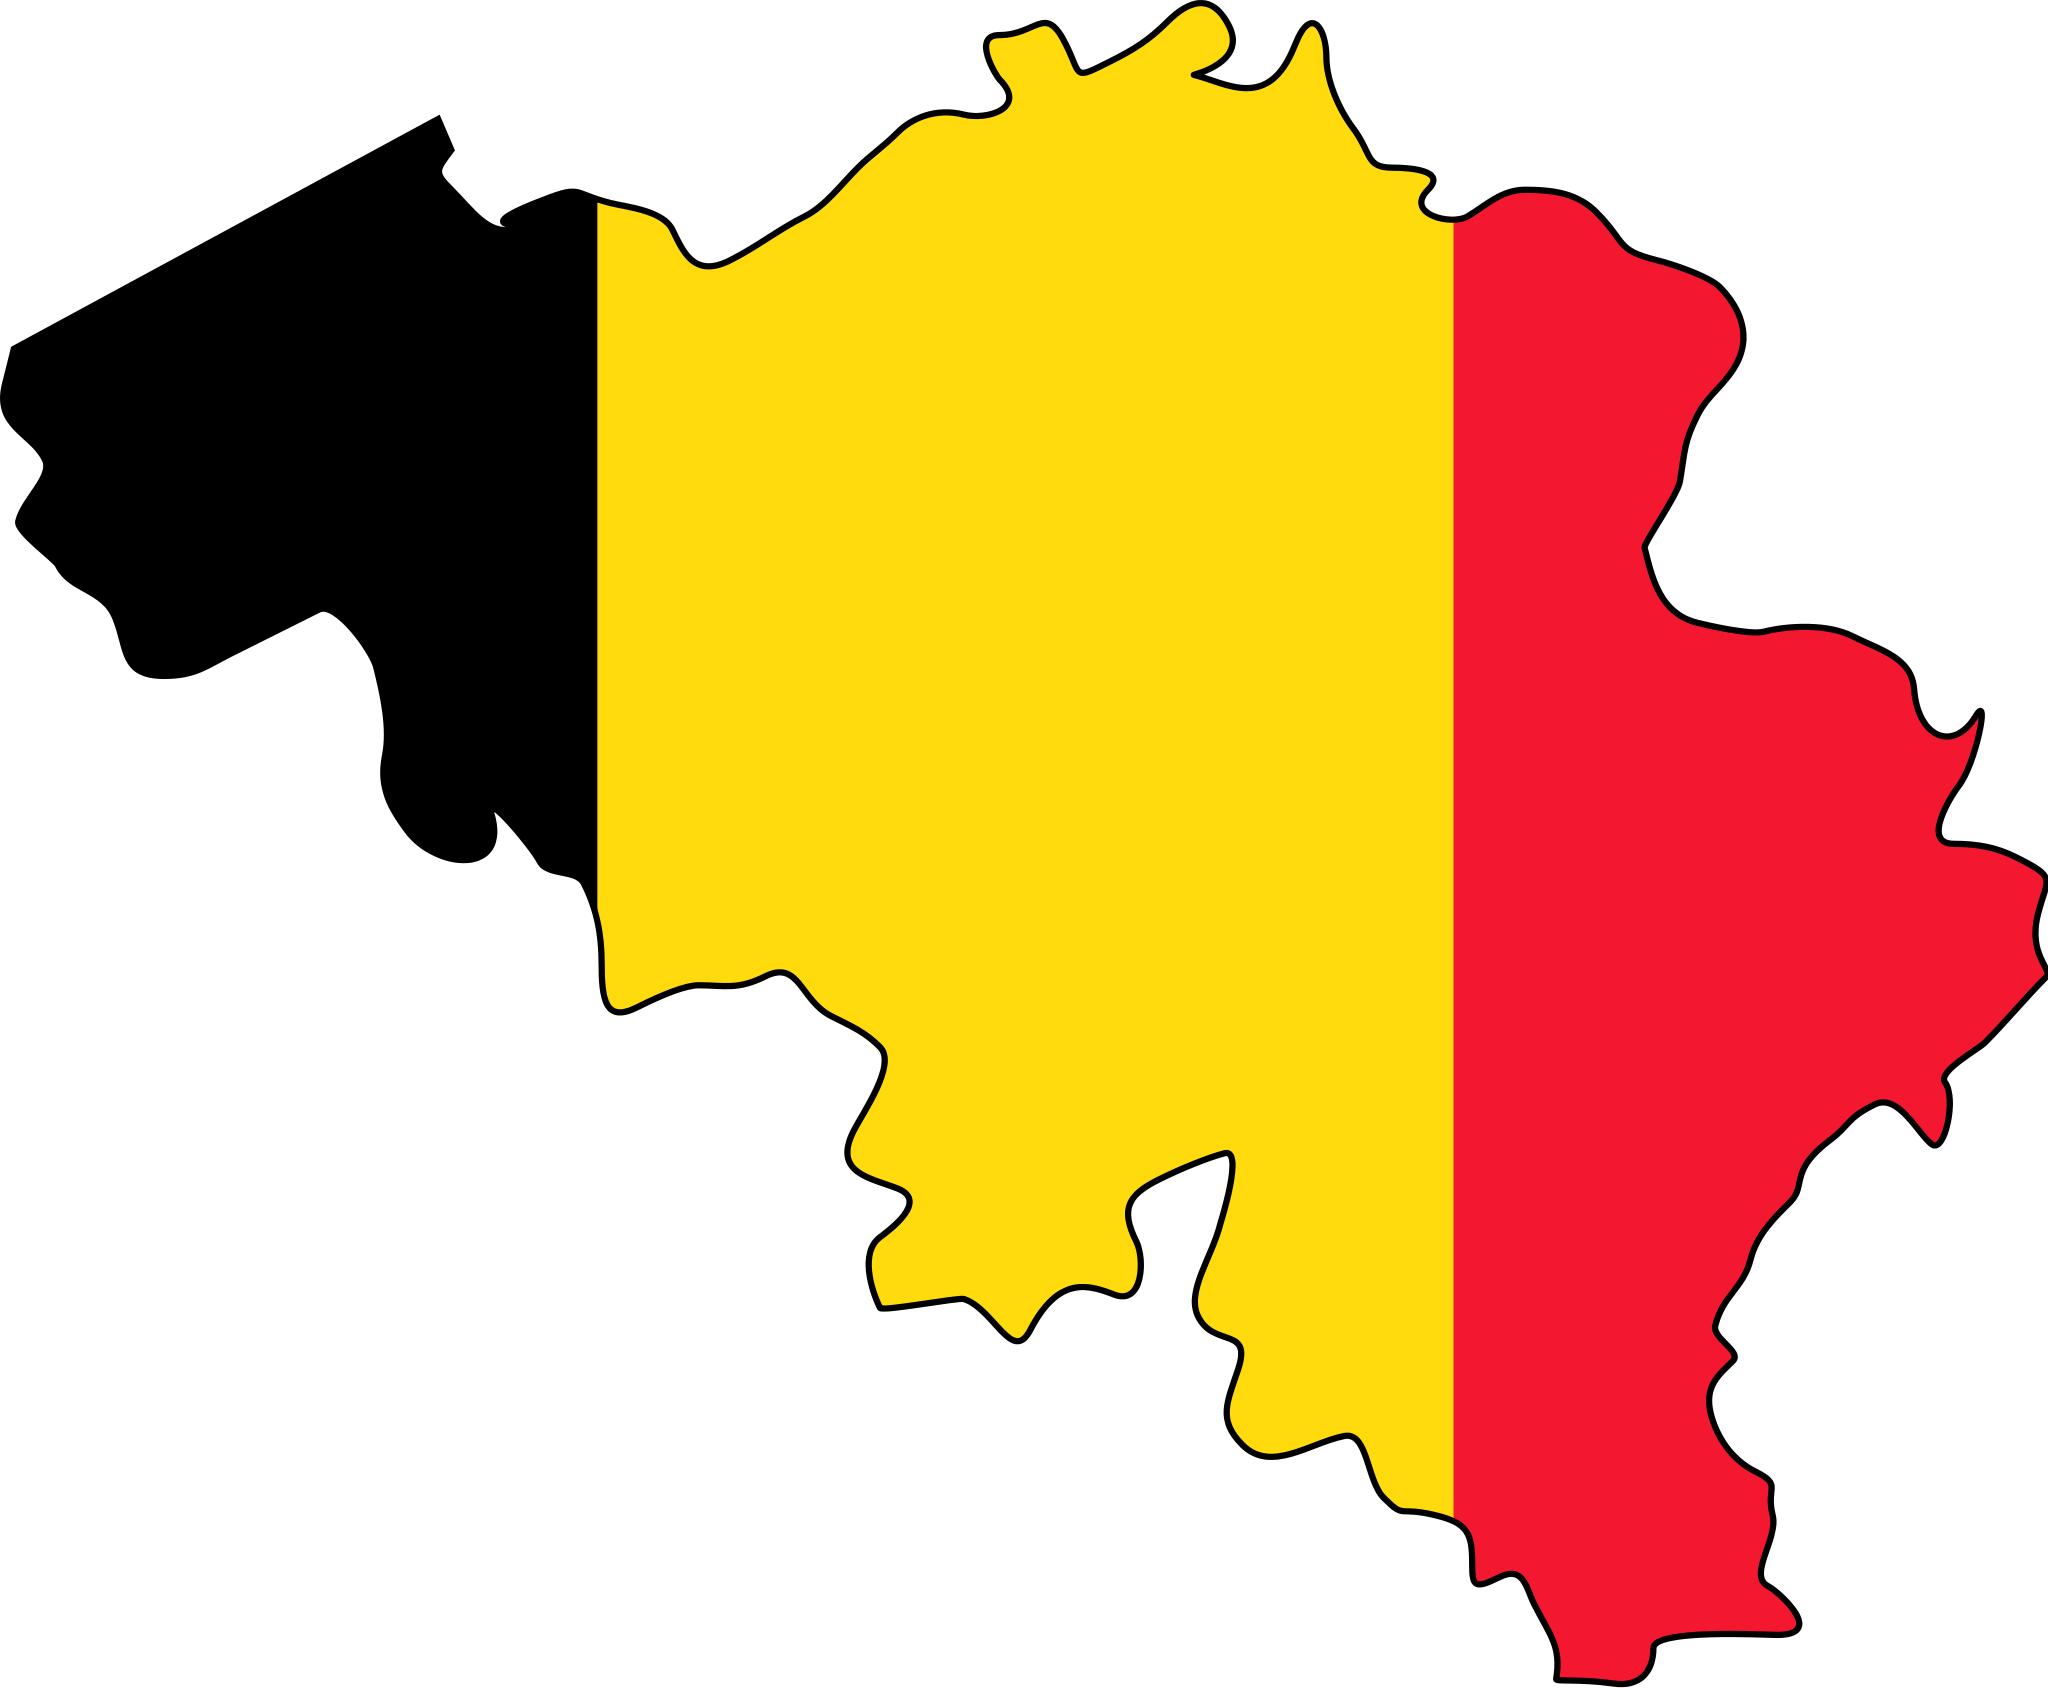 Country clipart state. Belgian beer buy online